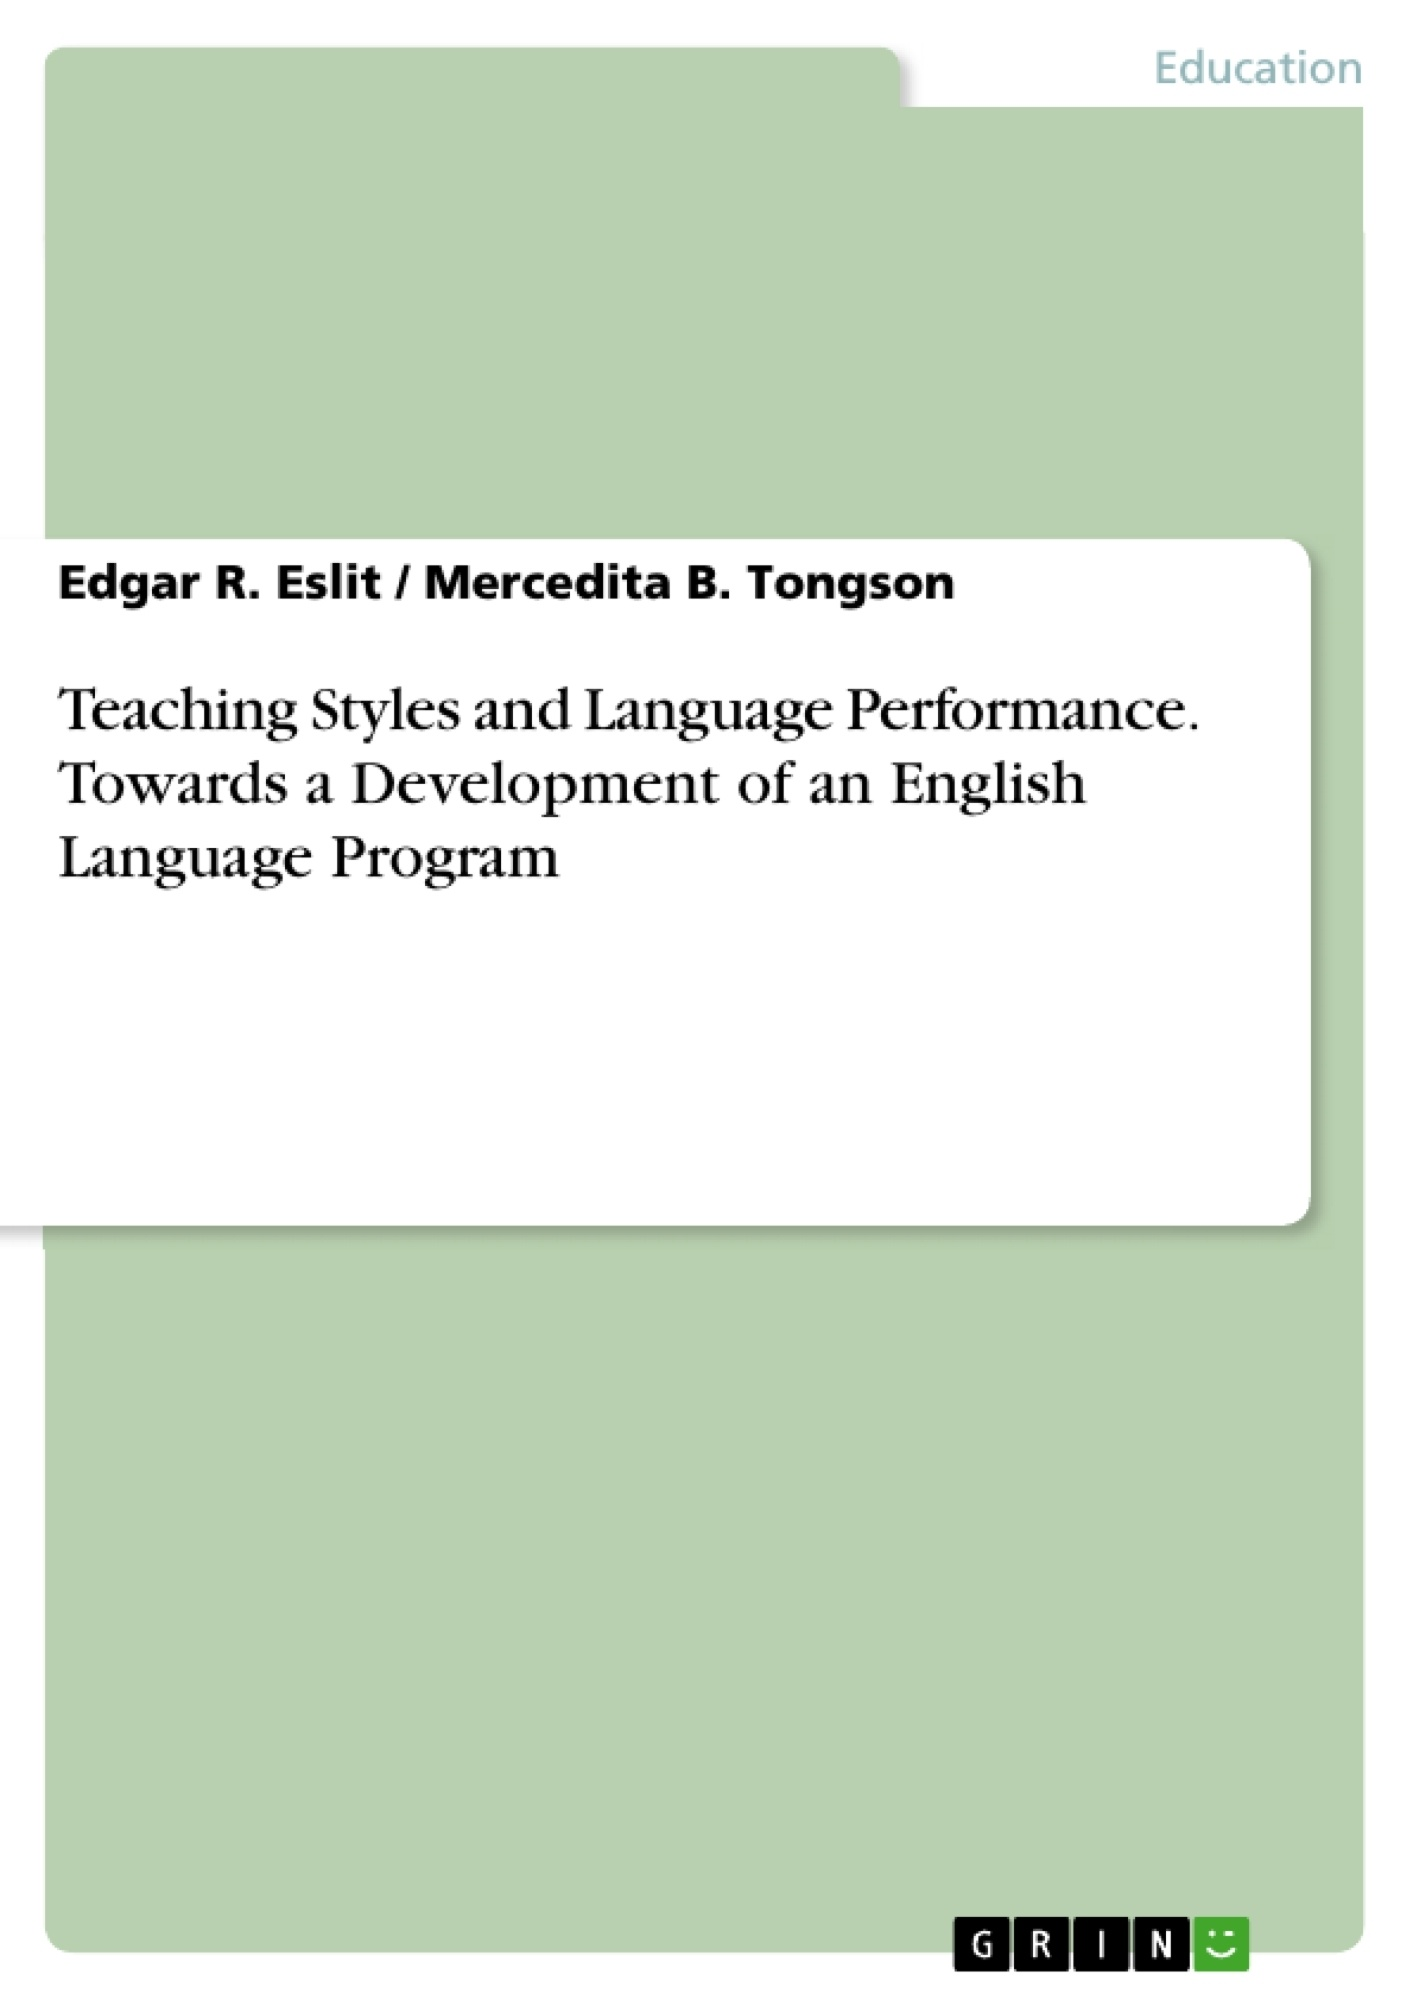 Title: Teaching Styles and Language Performance. Towards a Development of an English Language Program